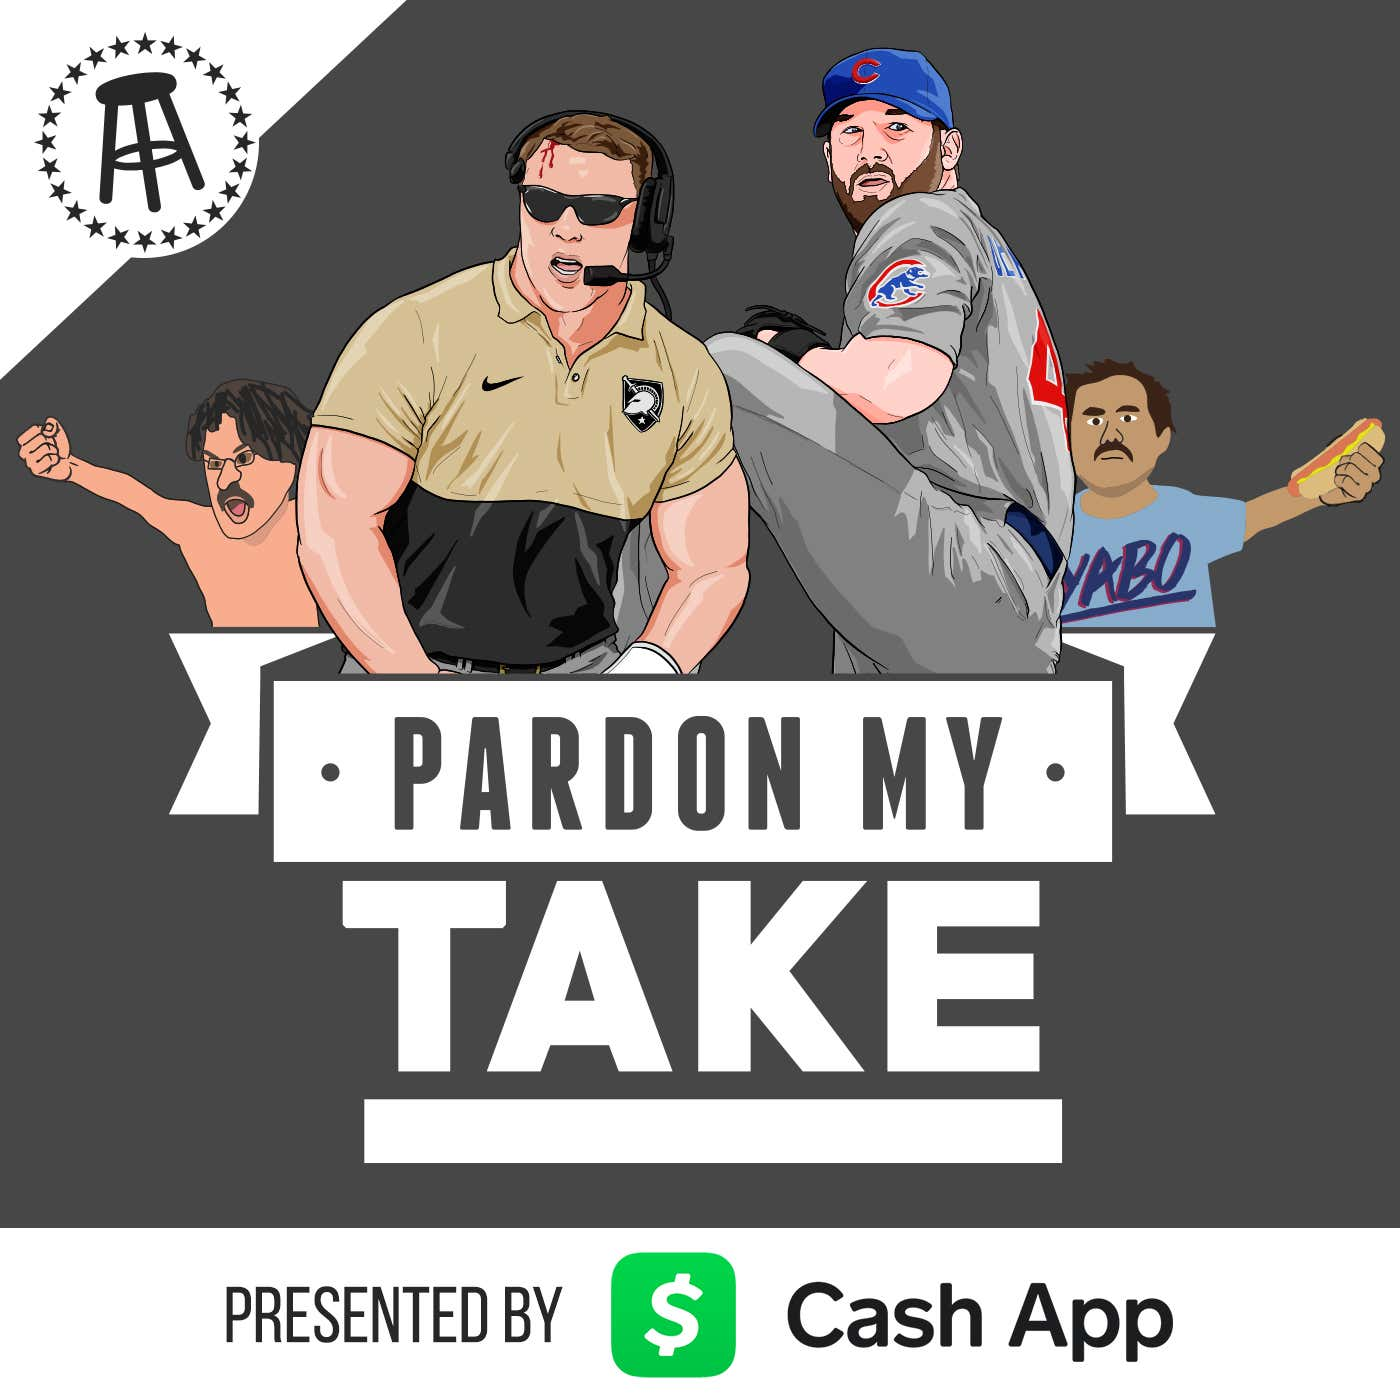 Ryan Dempster, Army Coach Mike Viti, Ravens Frauds And MLB/NBA Playoffs